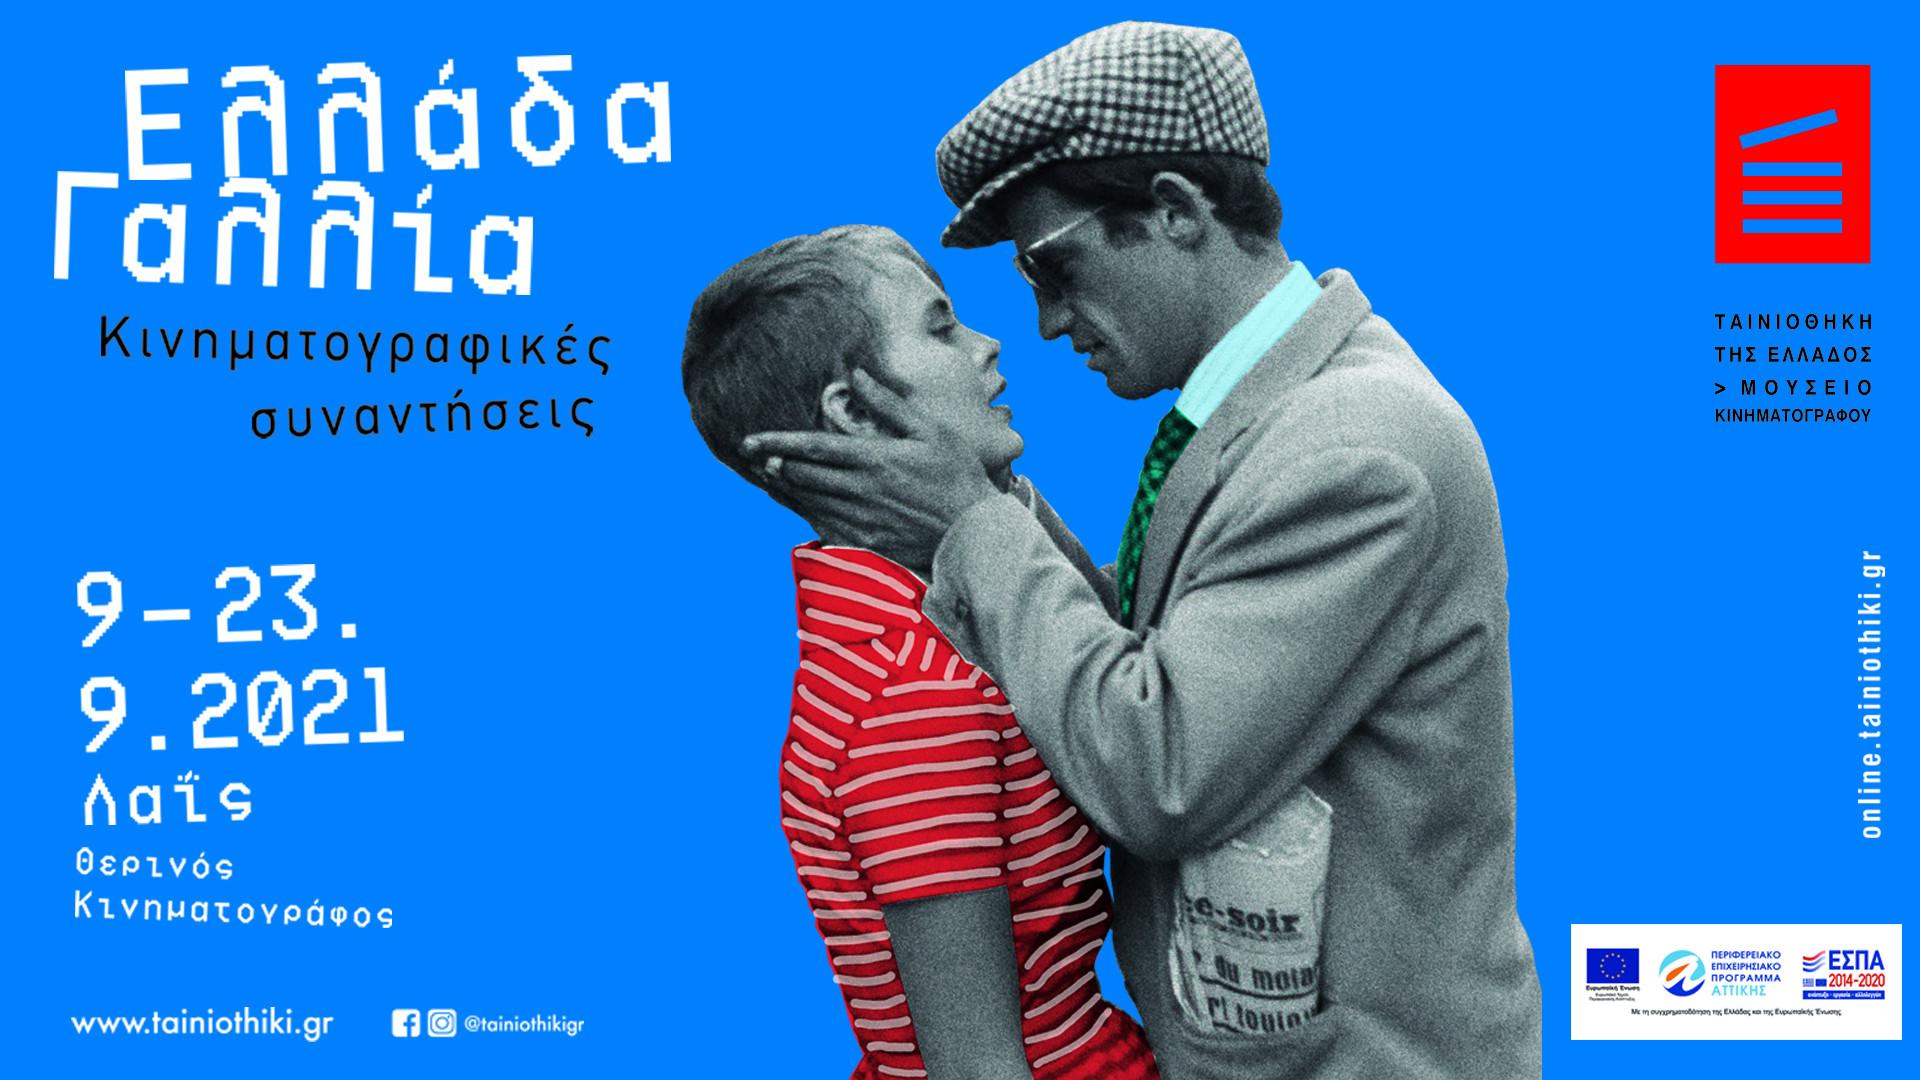 Greece-France: Cinema dialogues